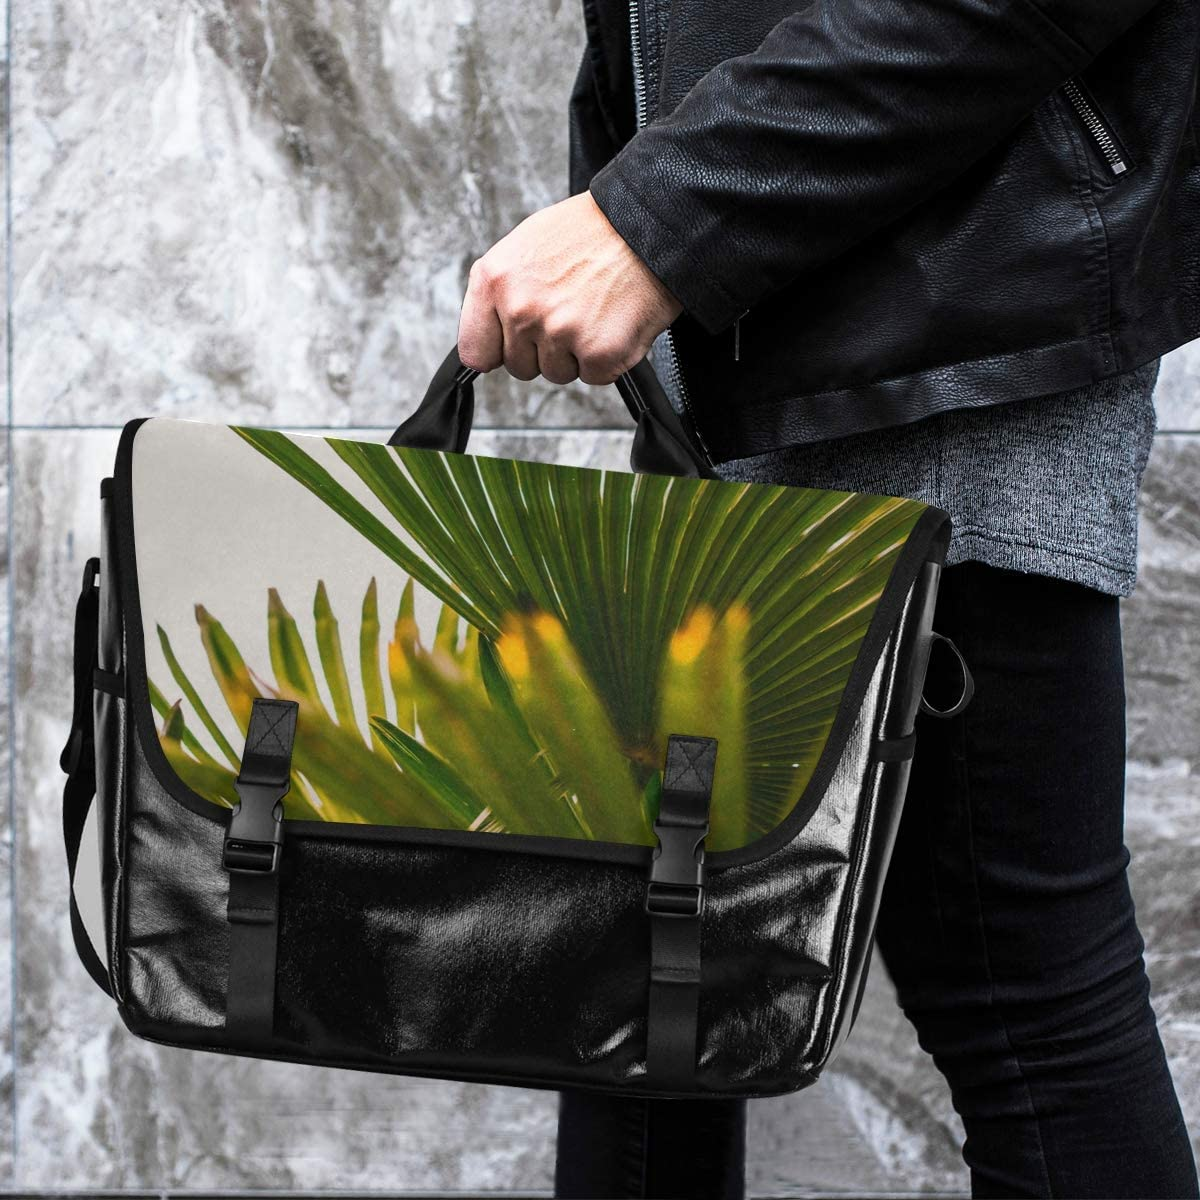 Laptop Computer Traveling Camping Casual Canvas Satchel Green Leaves Nature Messenger Bag Shoulder Bag Happy for Men Women Student